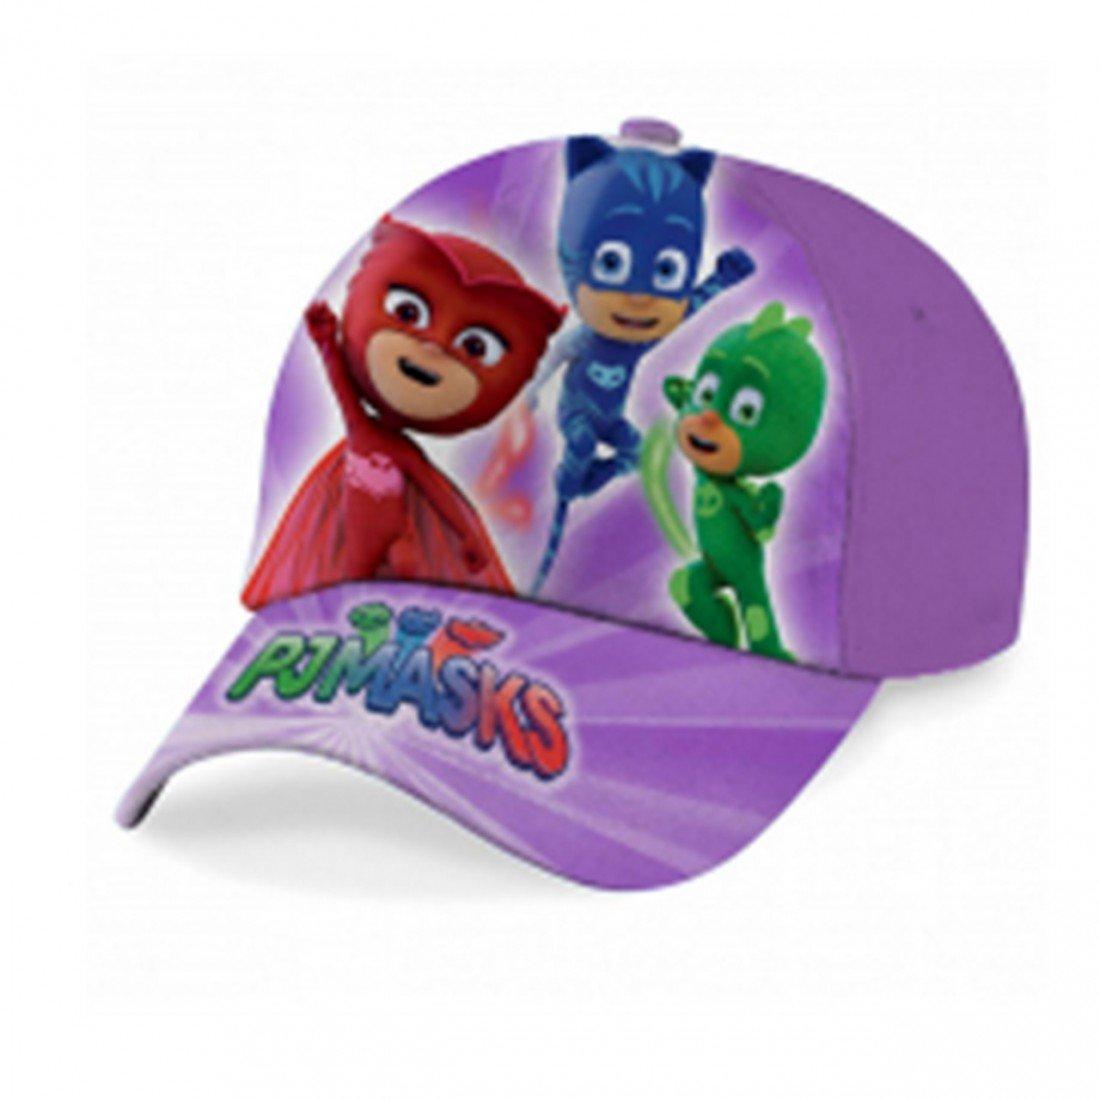 CAPPELLO bambina PJMASKS cappellino SUPERPIGIAMINI a visiera regolabile velcro